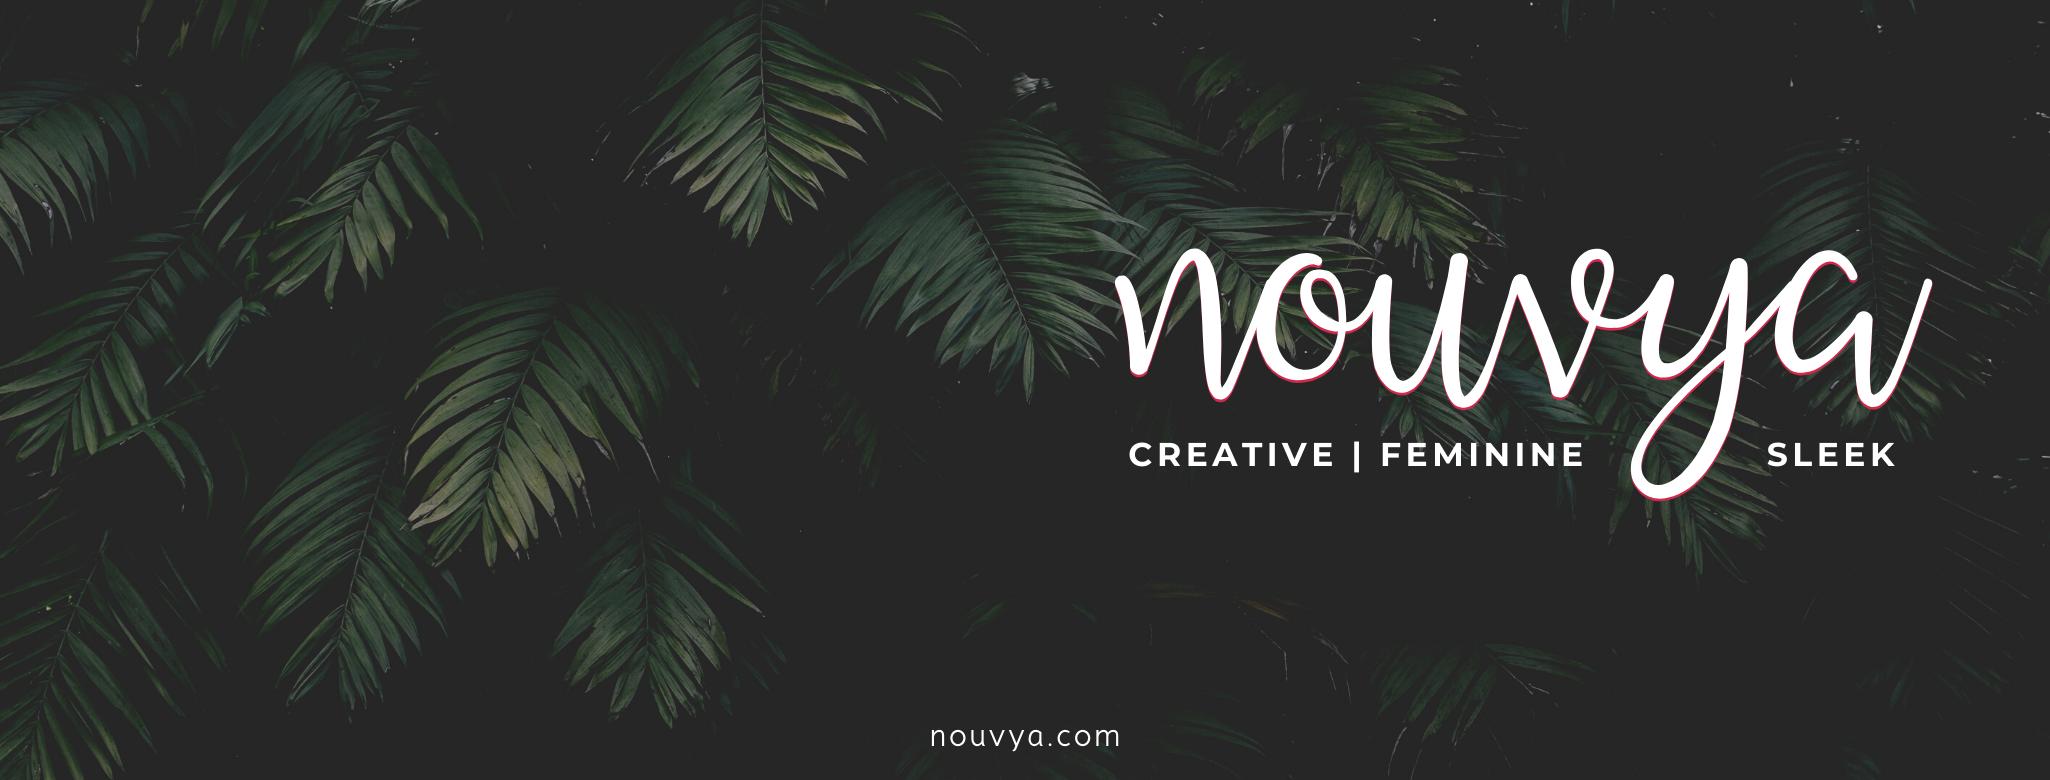 nouvya com cover.png